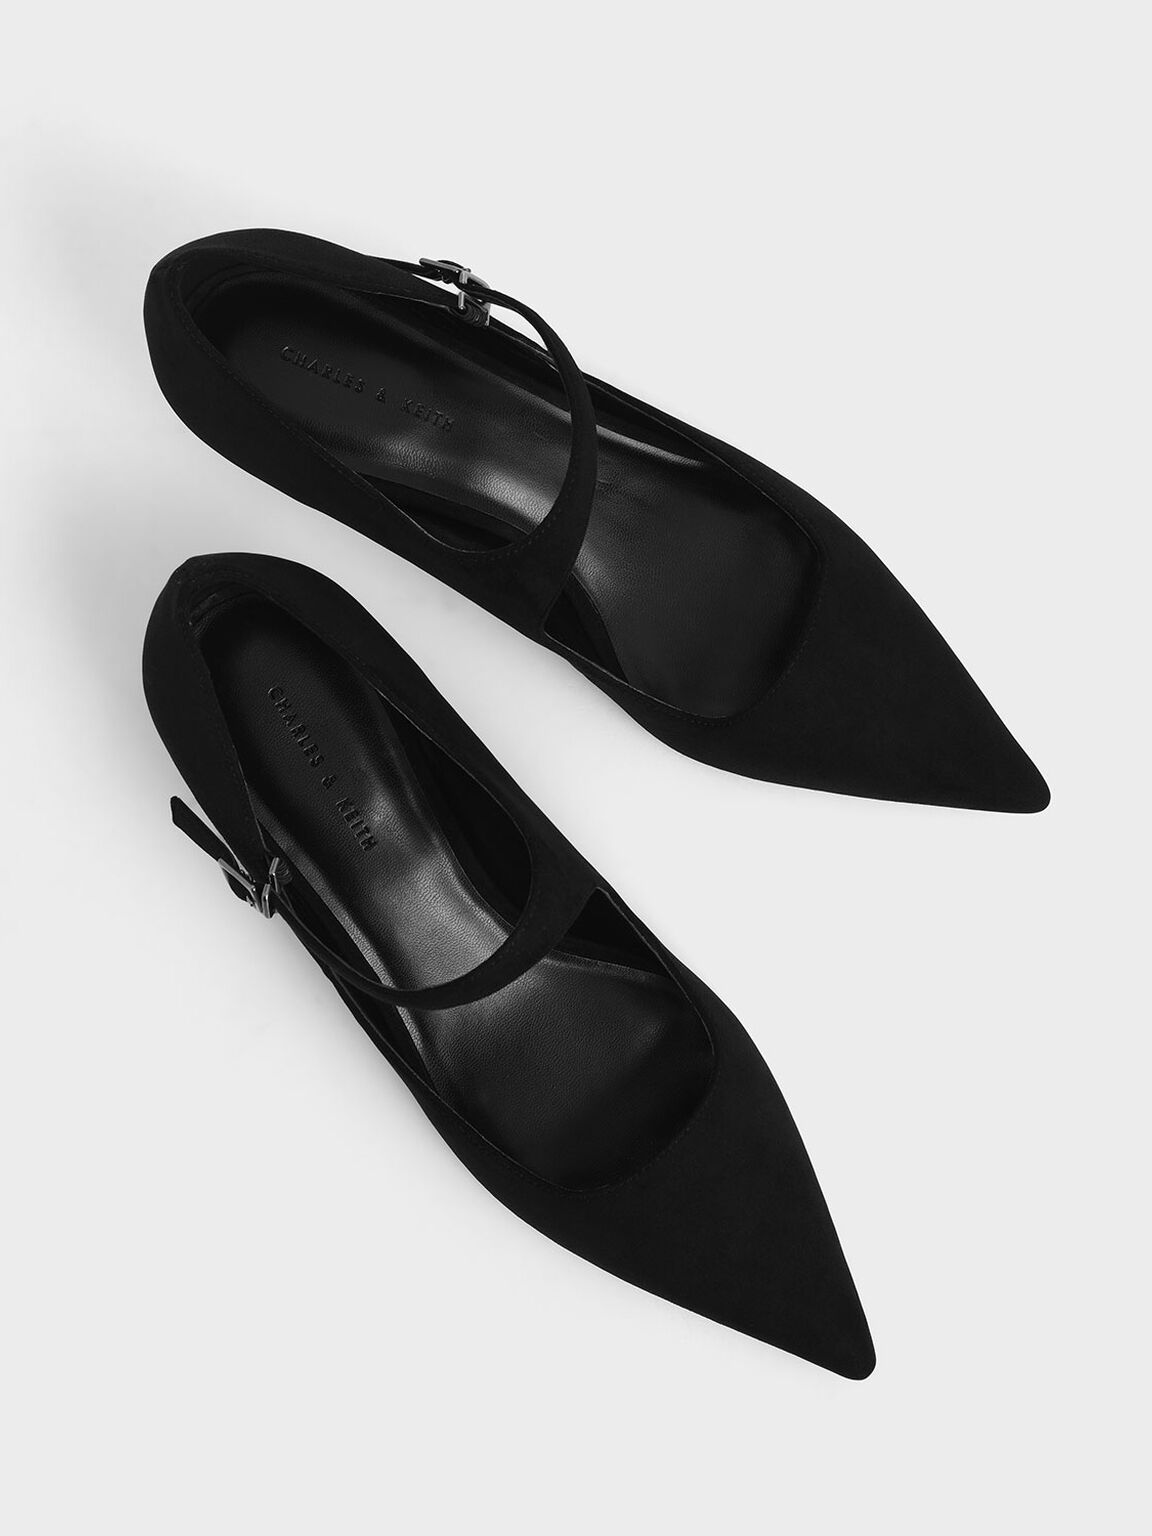 Textured Asymmetric Mary Jane Kitten Heels, Black, hi-res